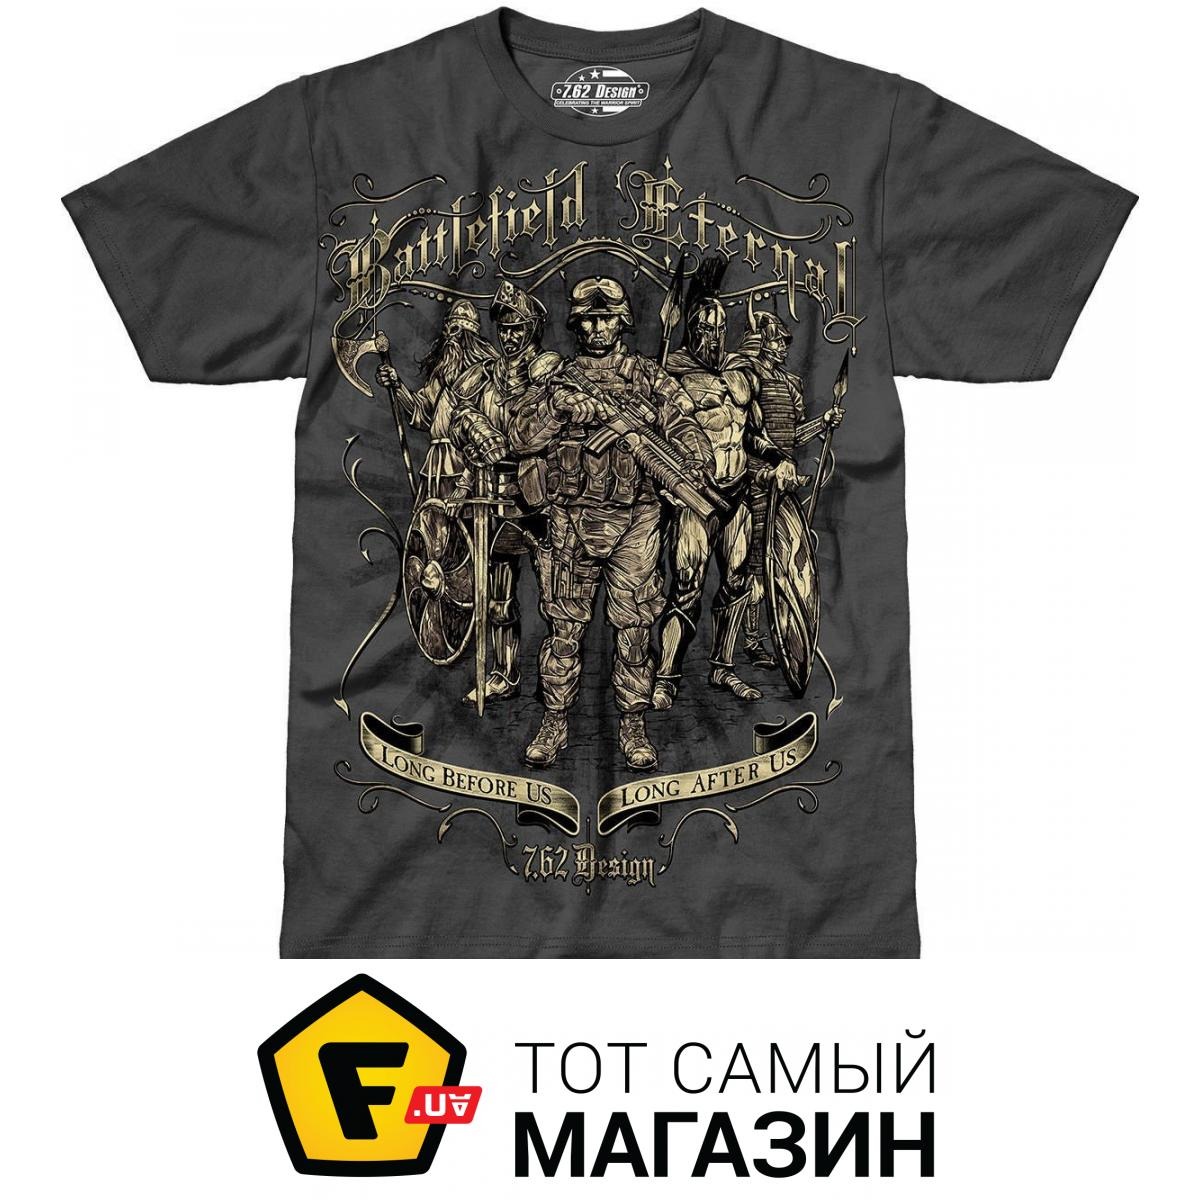 ᐈ 7.62 DESIGN Battlefield Eternal Premium Charcoal Gray ...